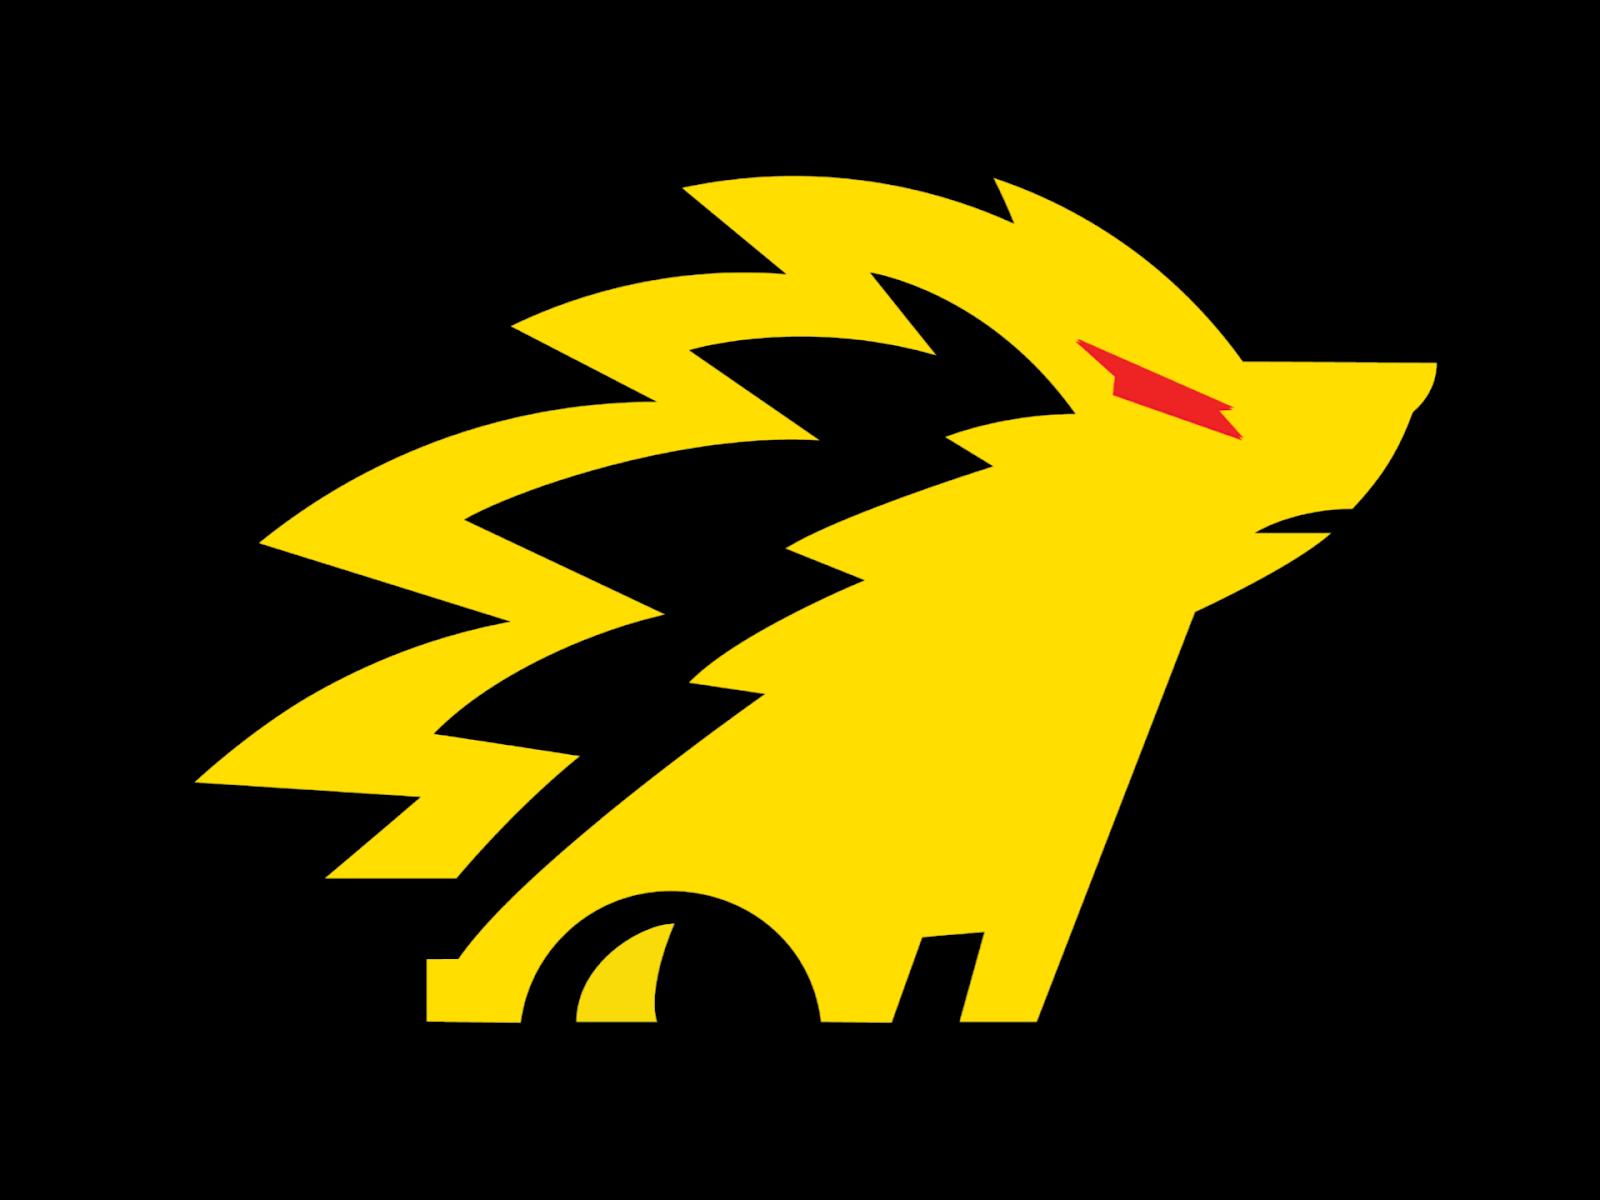 Logo Onic Esports Format PNG